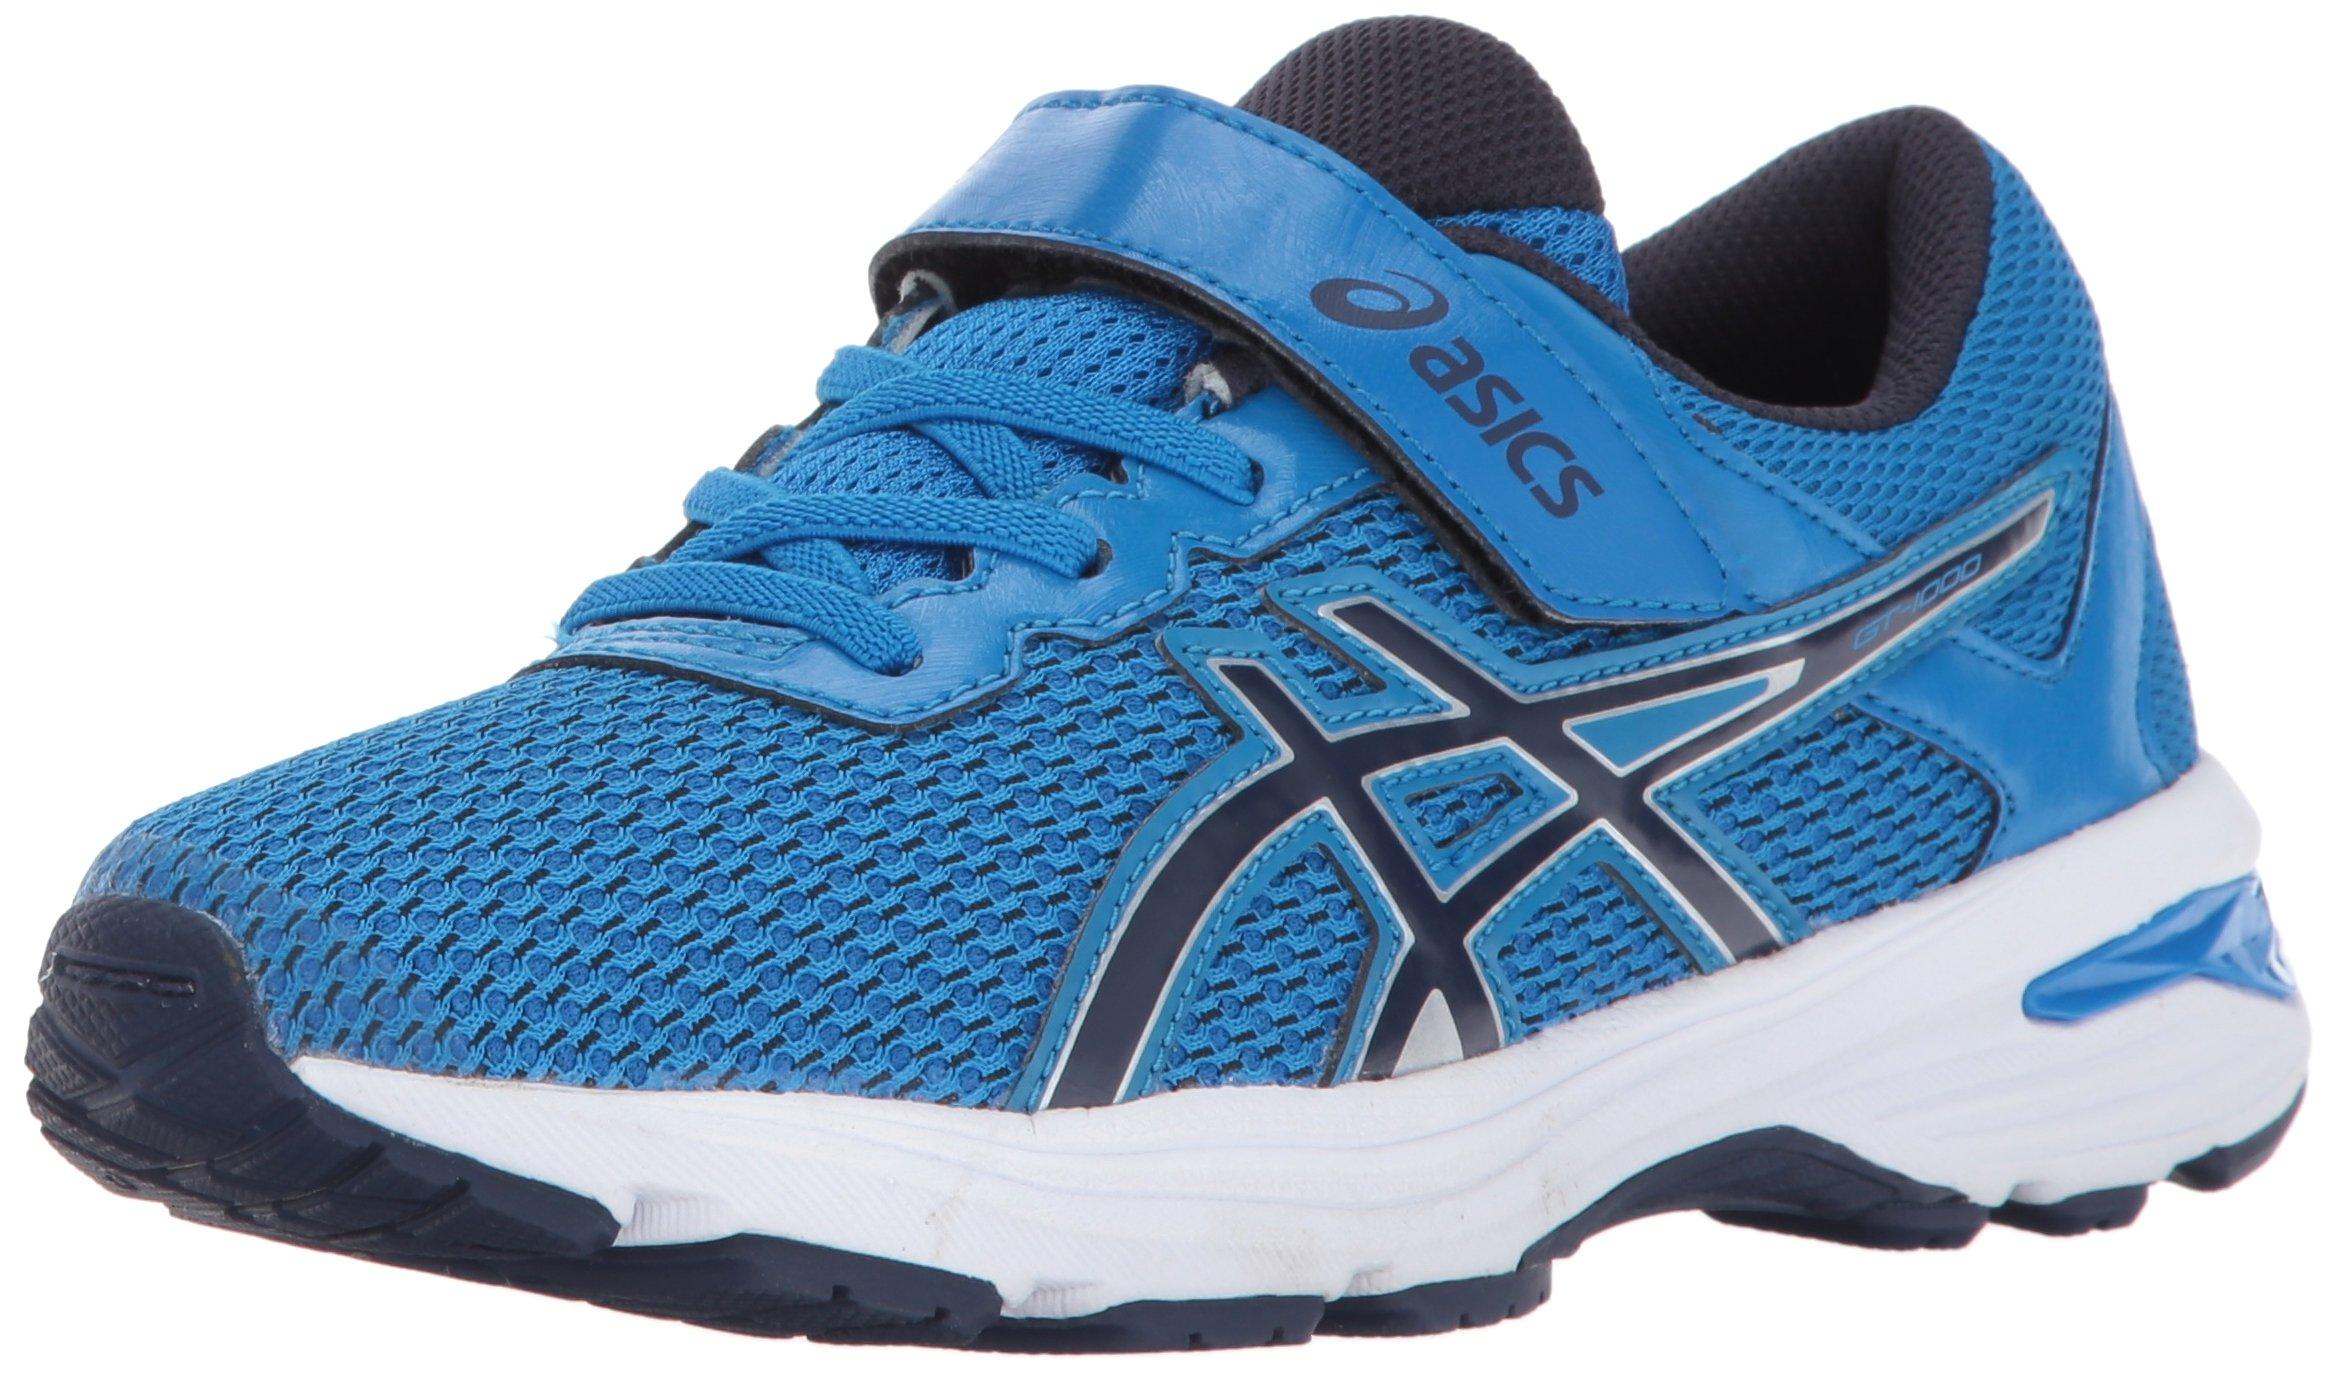 ASICS Unisex-Kids GT-1000 6 PS Running Shoe, Directoire Blue/Peacoat/Silver, 1.5 Medium US Little Kid